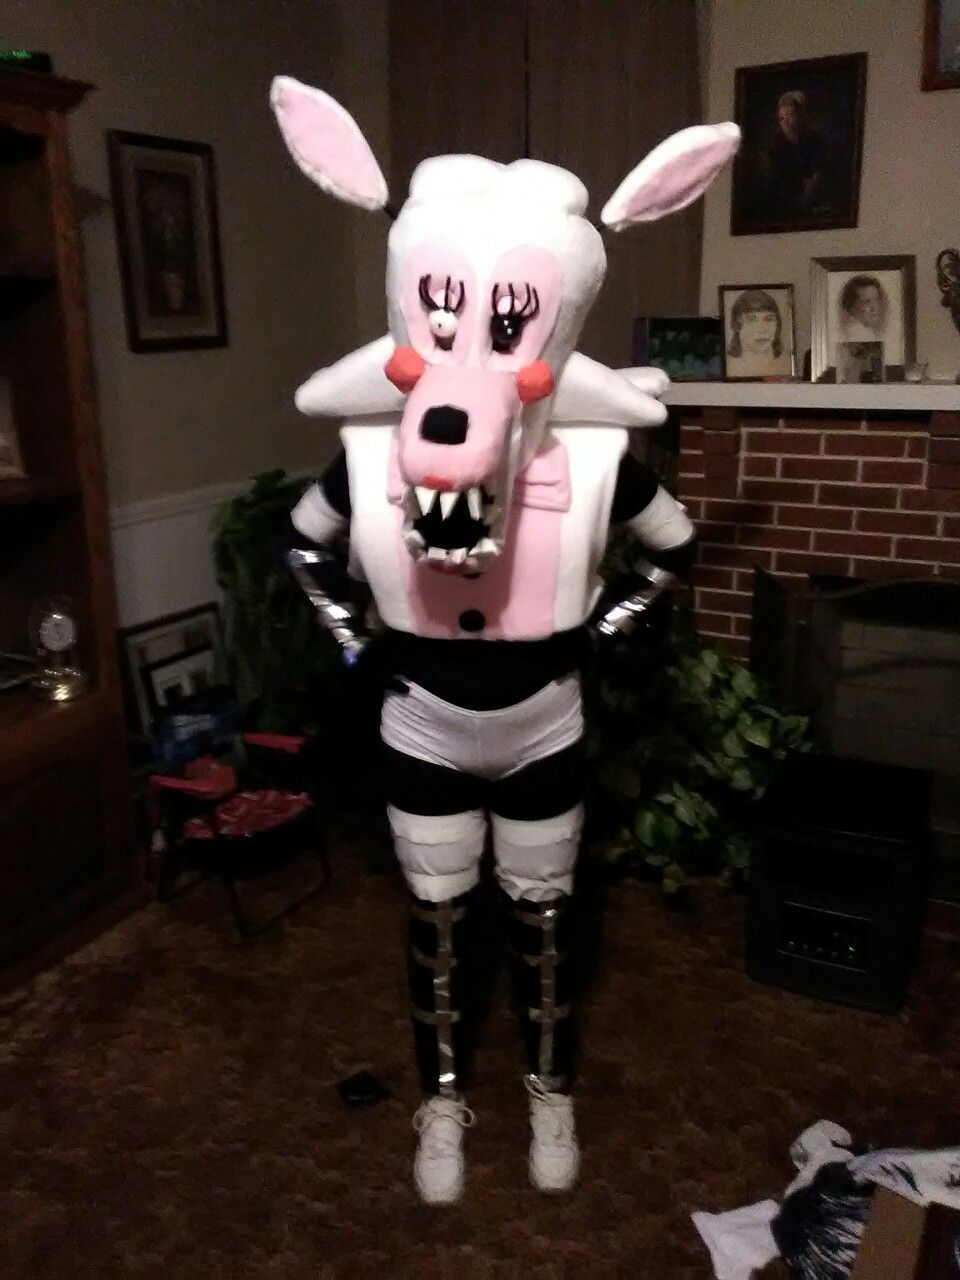 mangle costume I made. #mangle #fnaf #fivenightsatfreddys ...